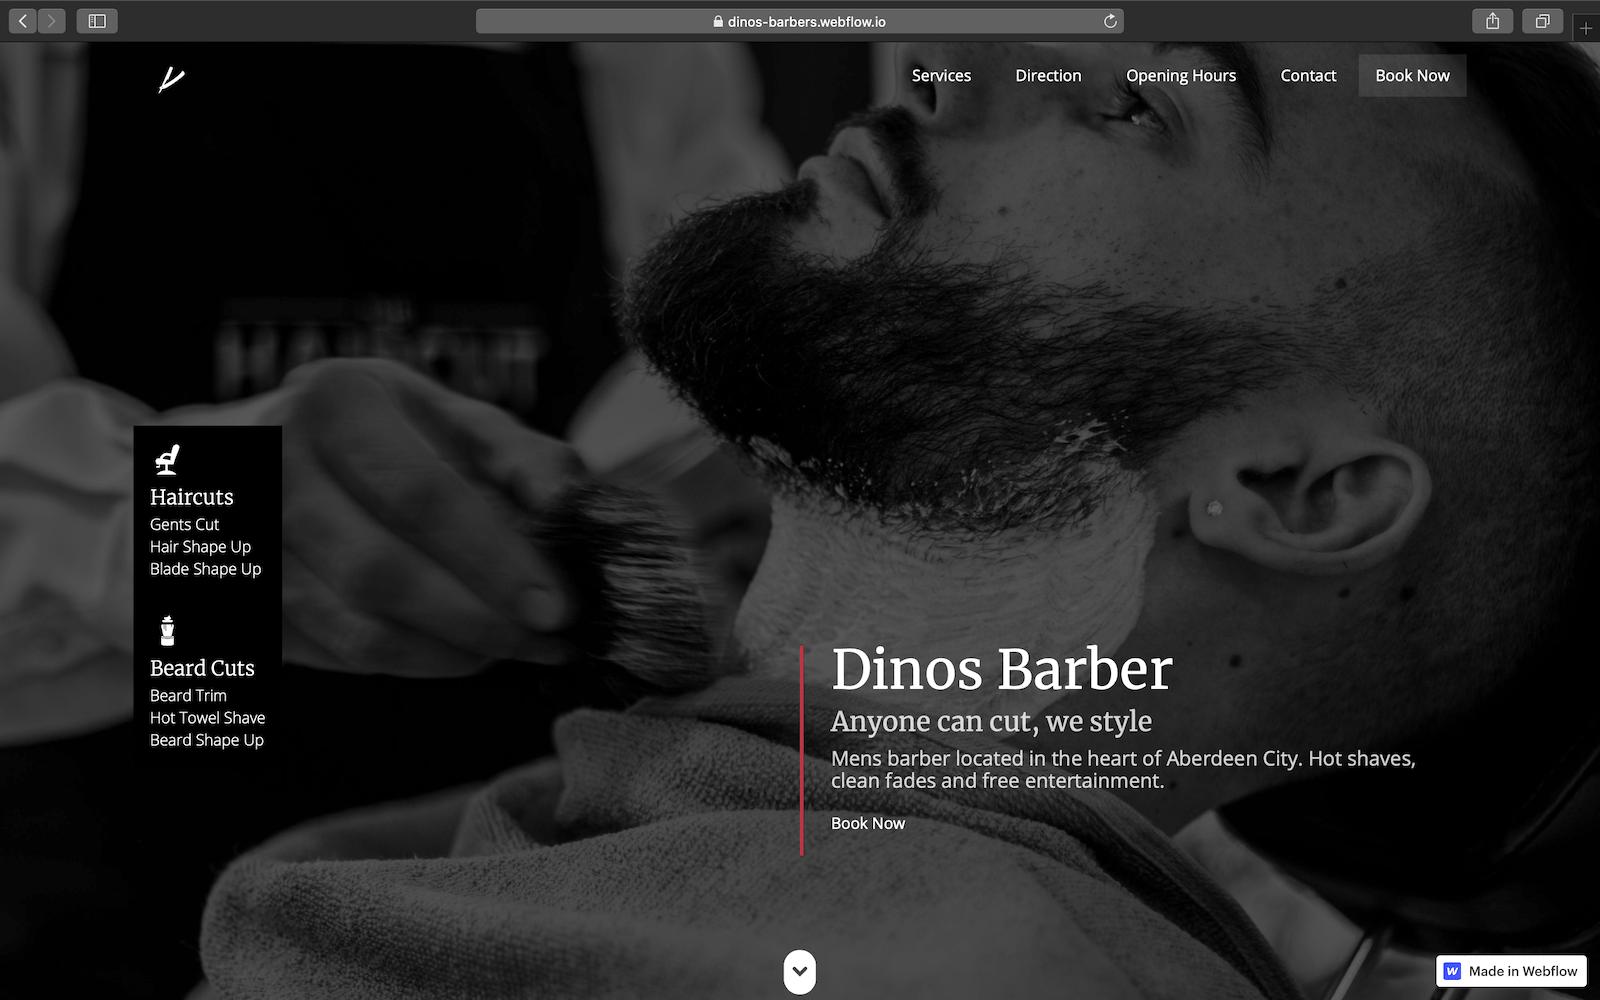 Dinos Barber